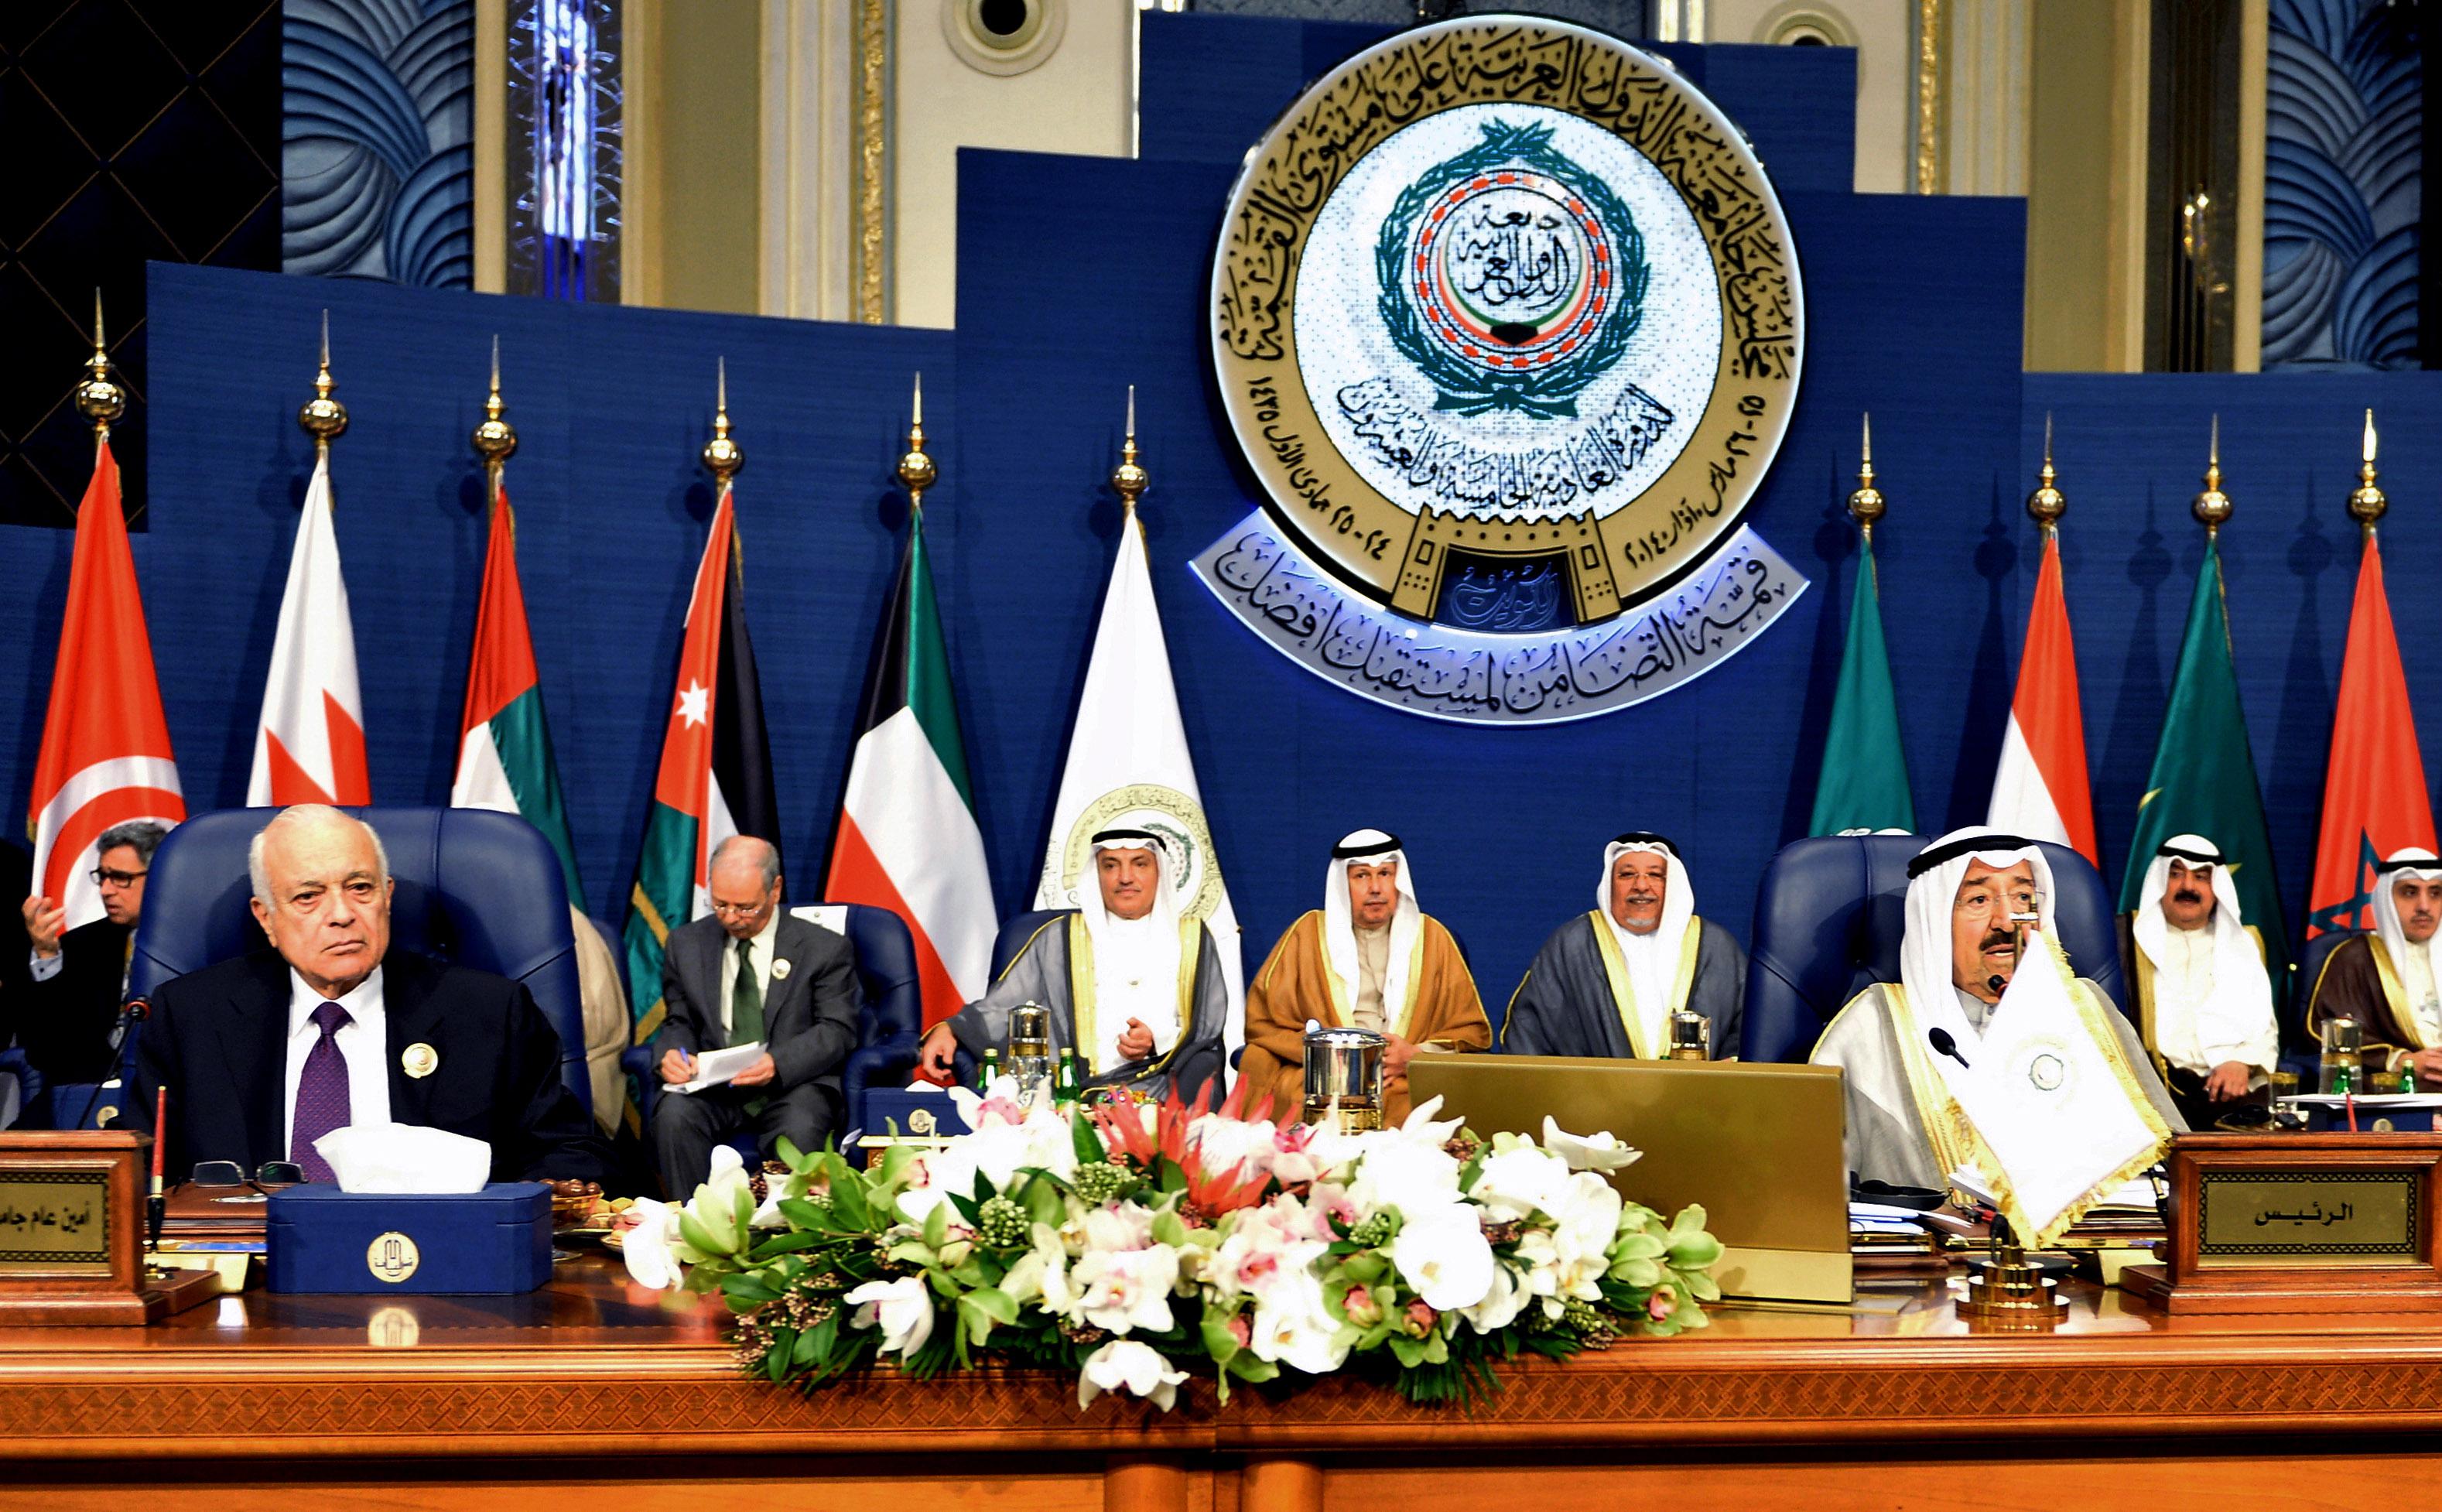 Liga Arab Sambut Baik Sikap UE Menentang Permukiman Ilegal Israel